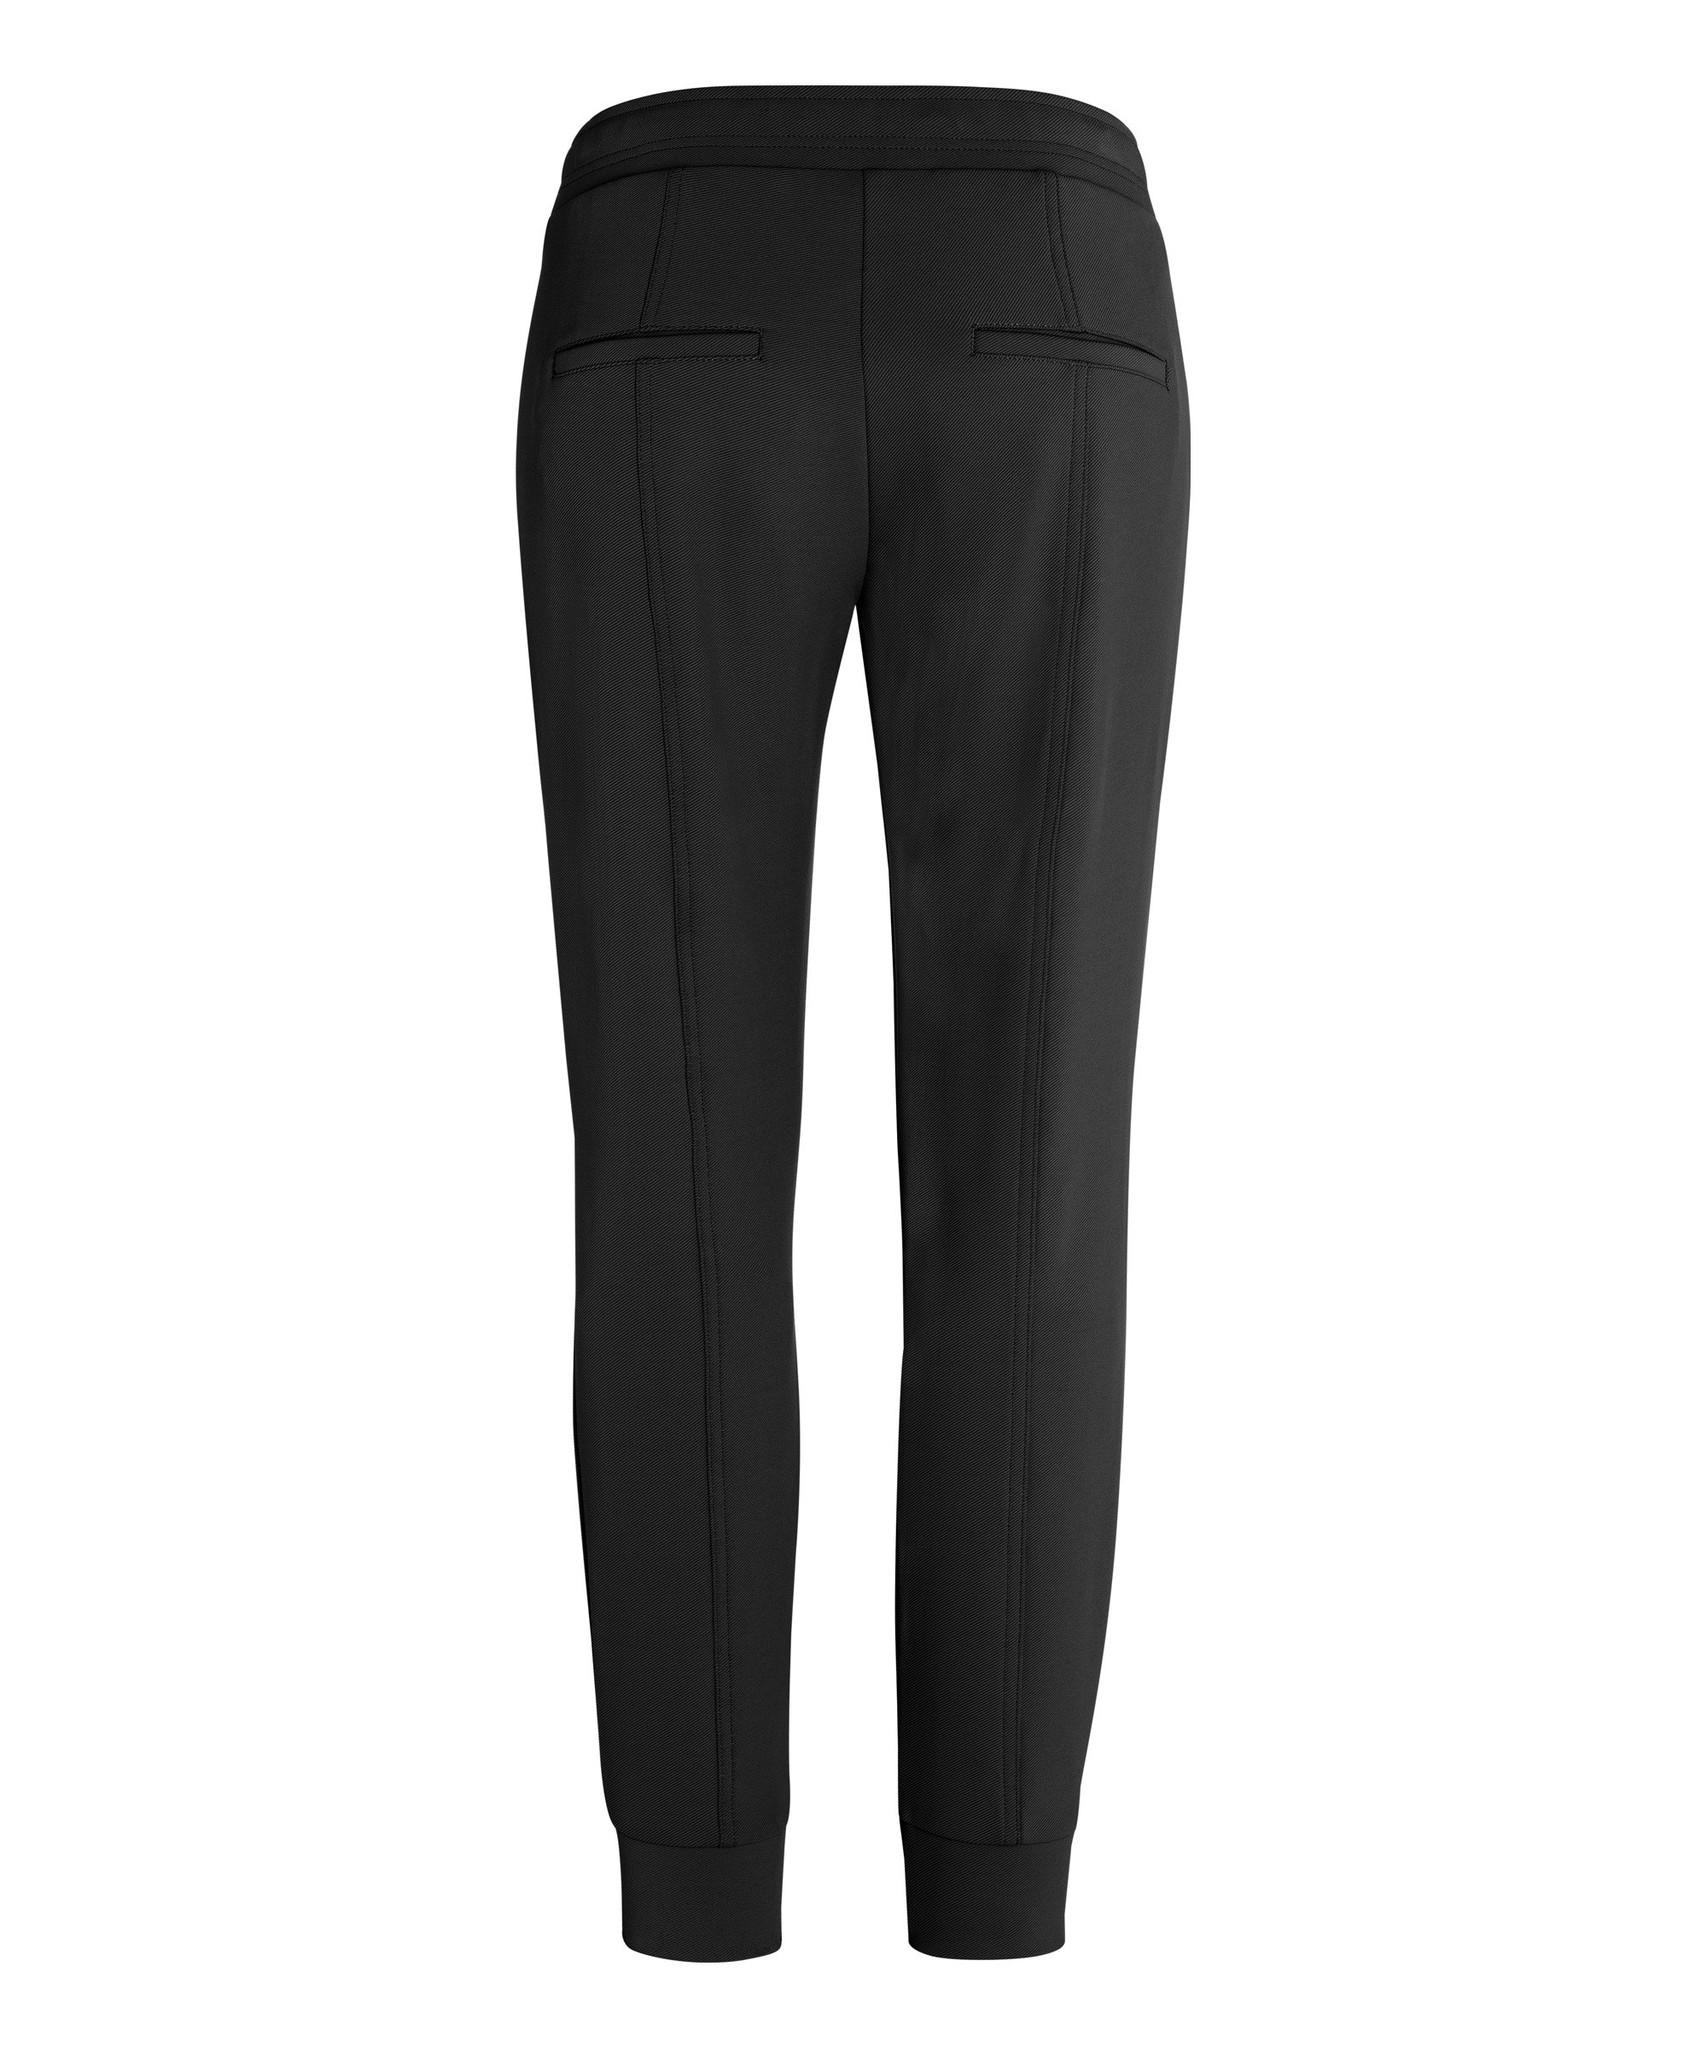 Cambio trousers JORDEN 6337-2